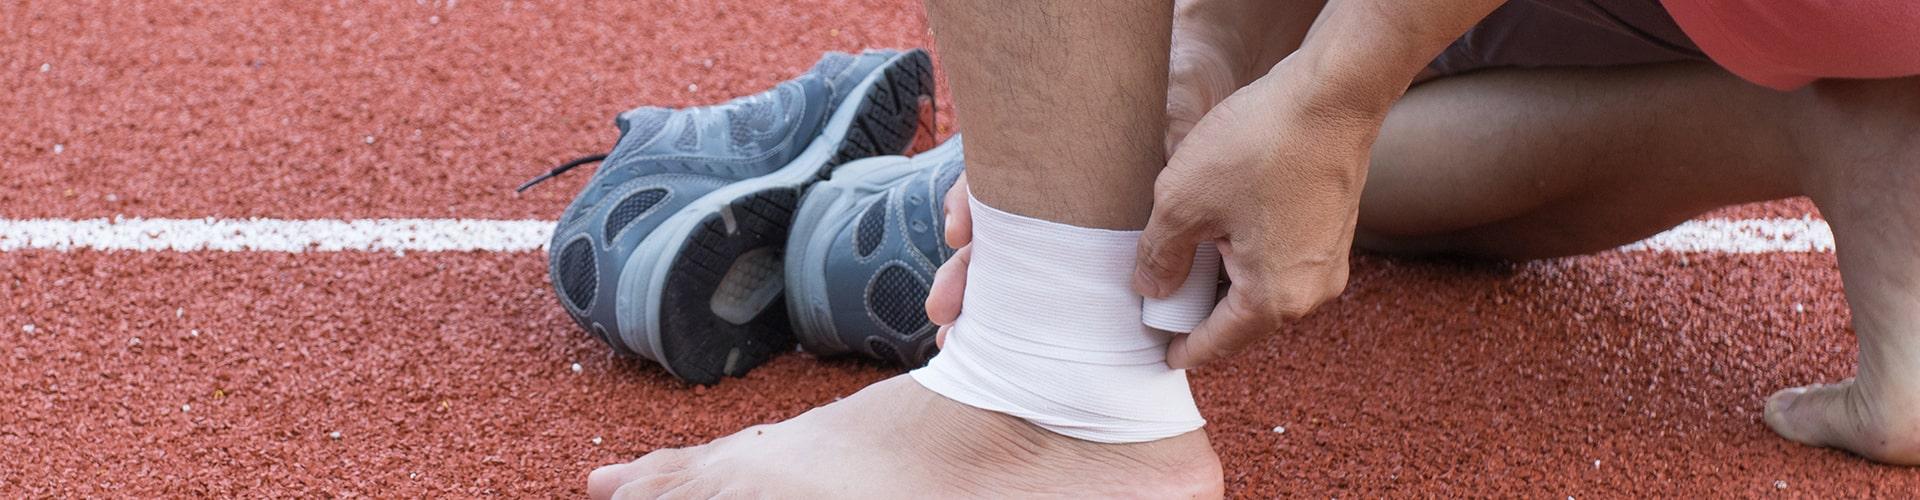 Common Orthosports Injuries Treatments Los Angeles, CA